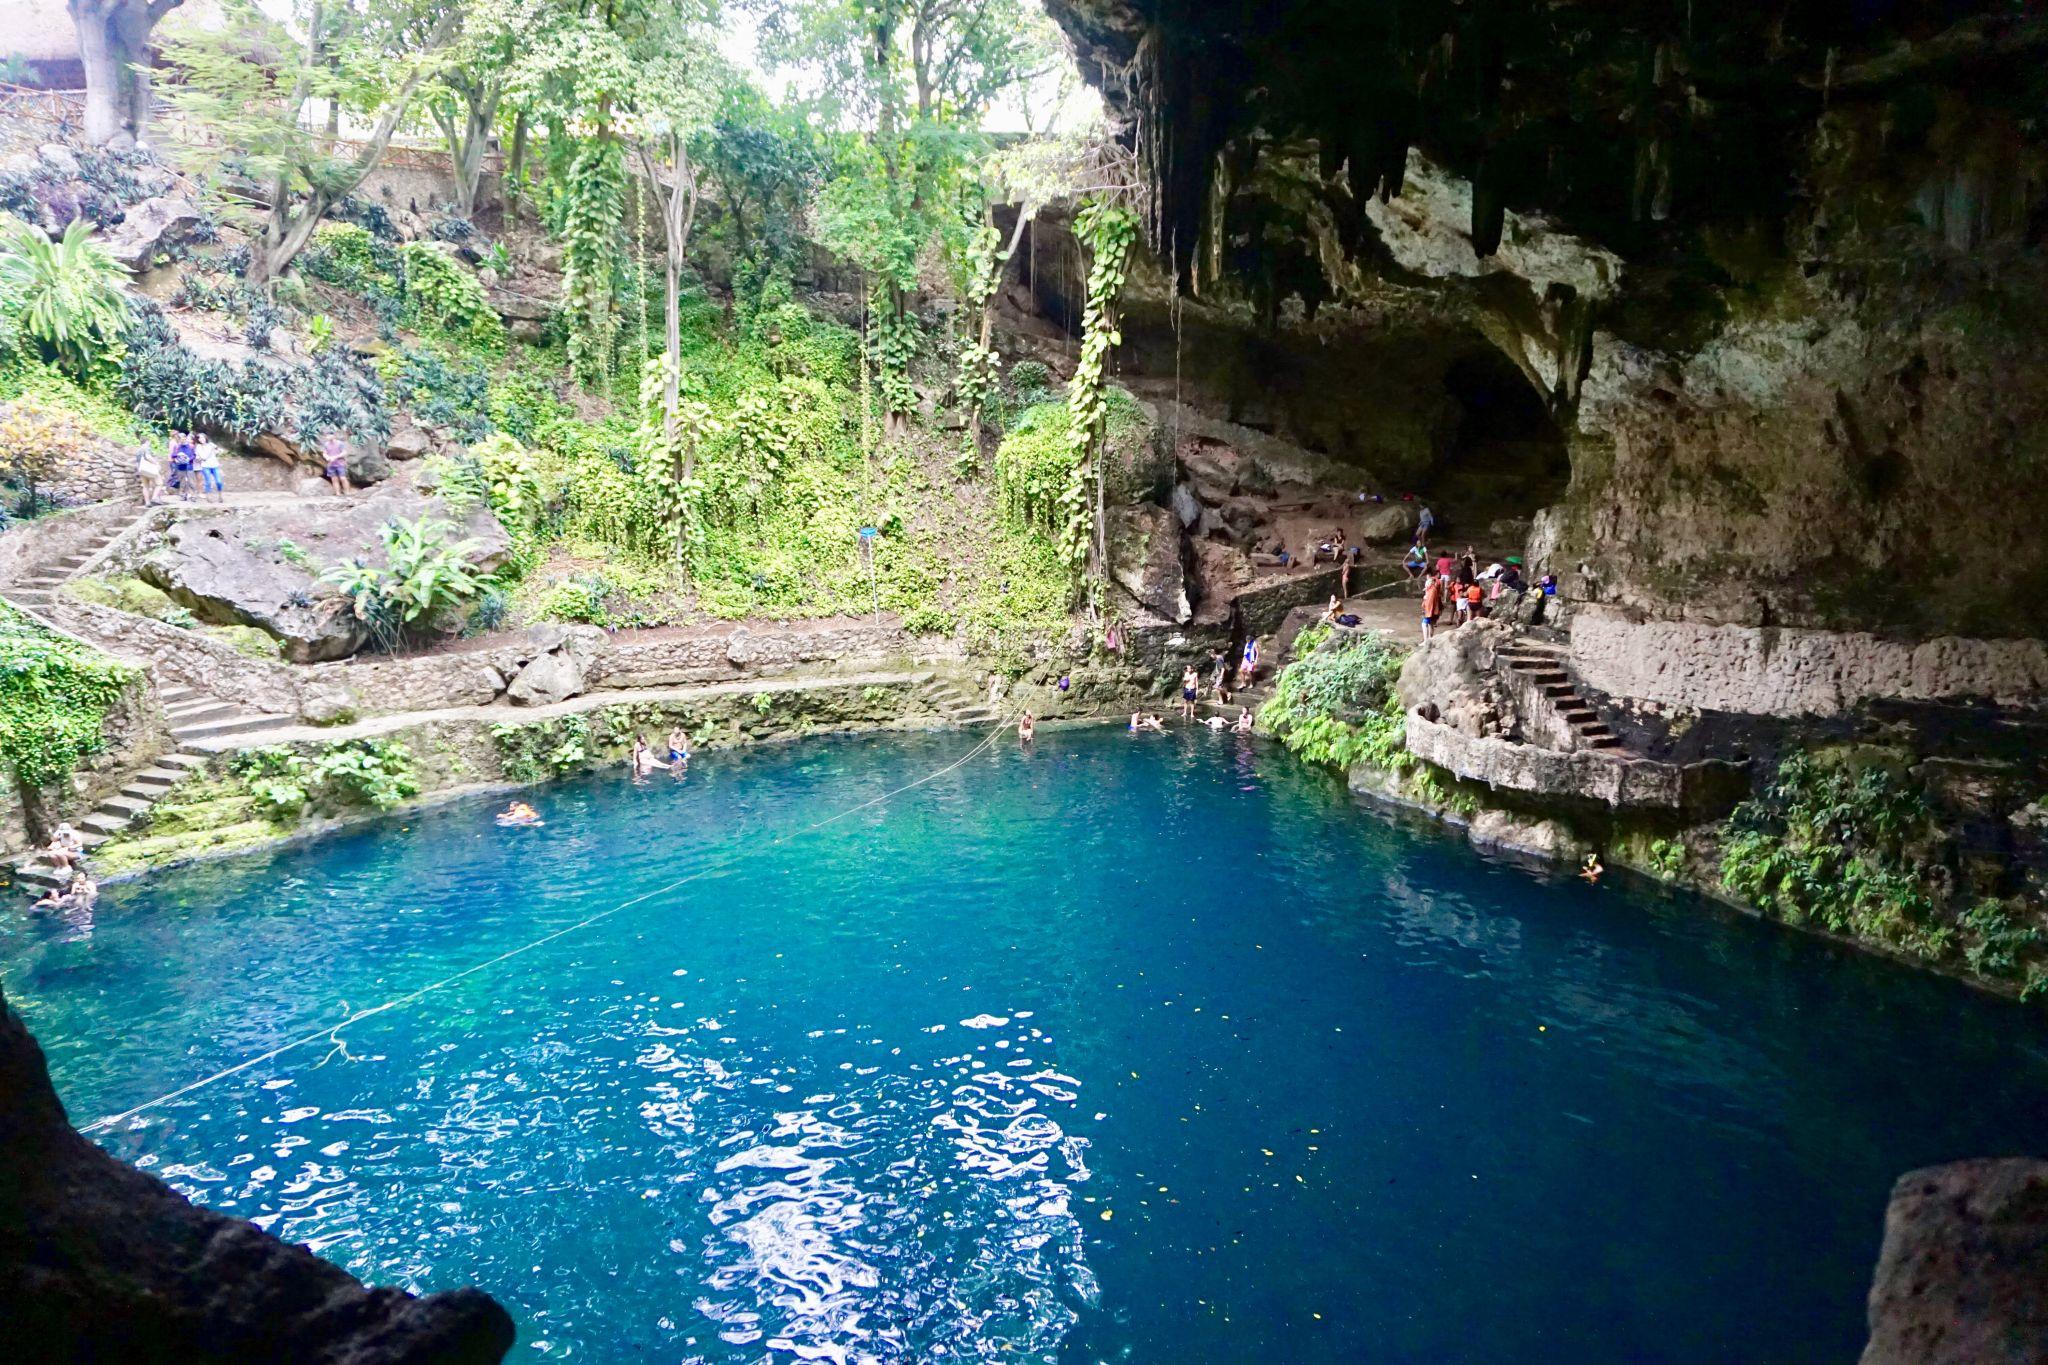 How to visit cenote Zaki in Valladolid